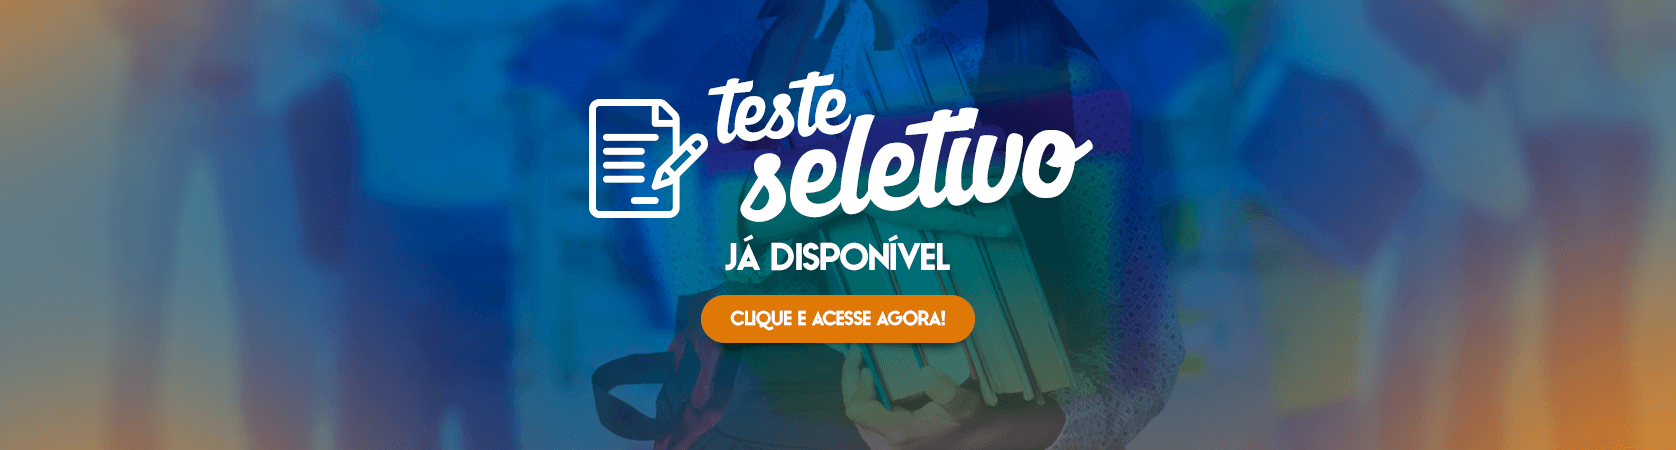 Teste Seletivo p/ 2019